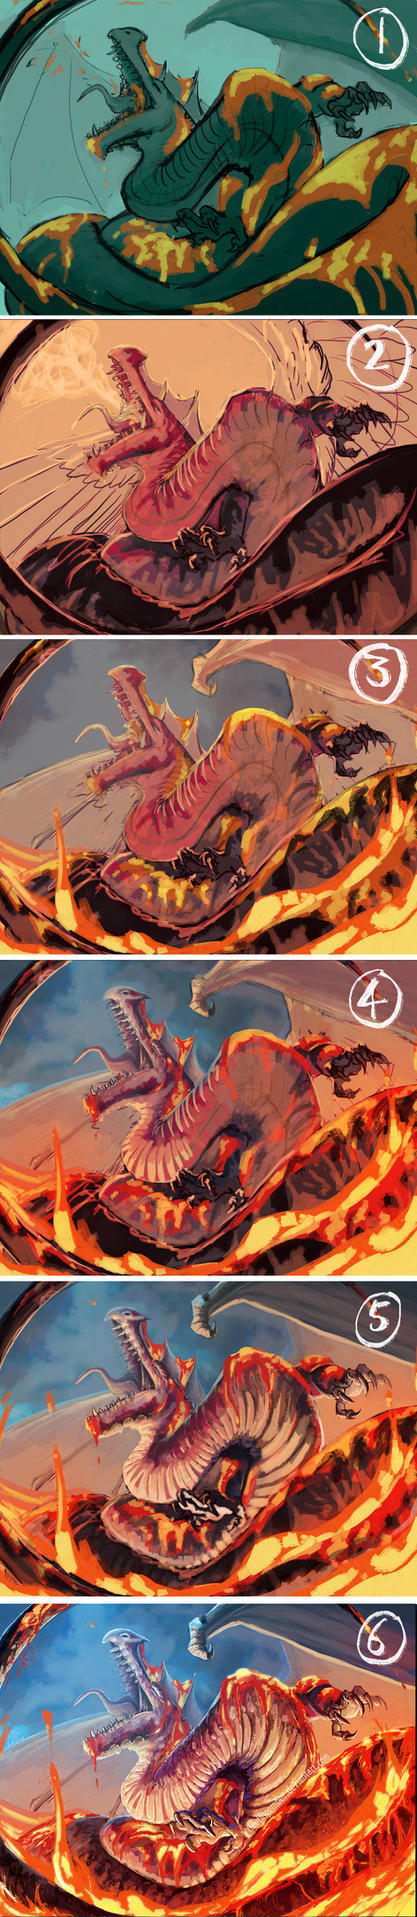 Lava Dragon Progress Walkthrough by FleetingEmber